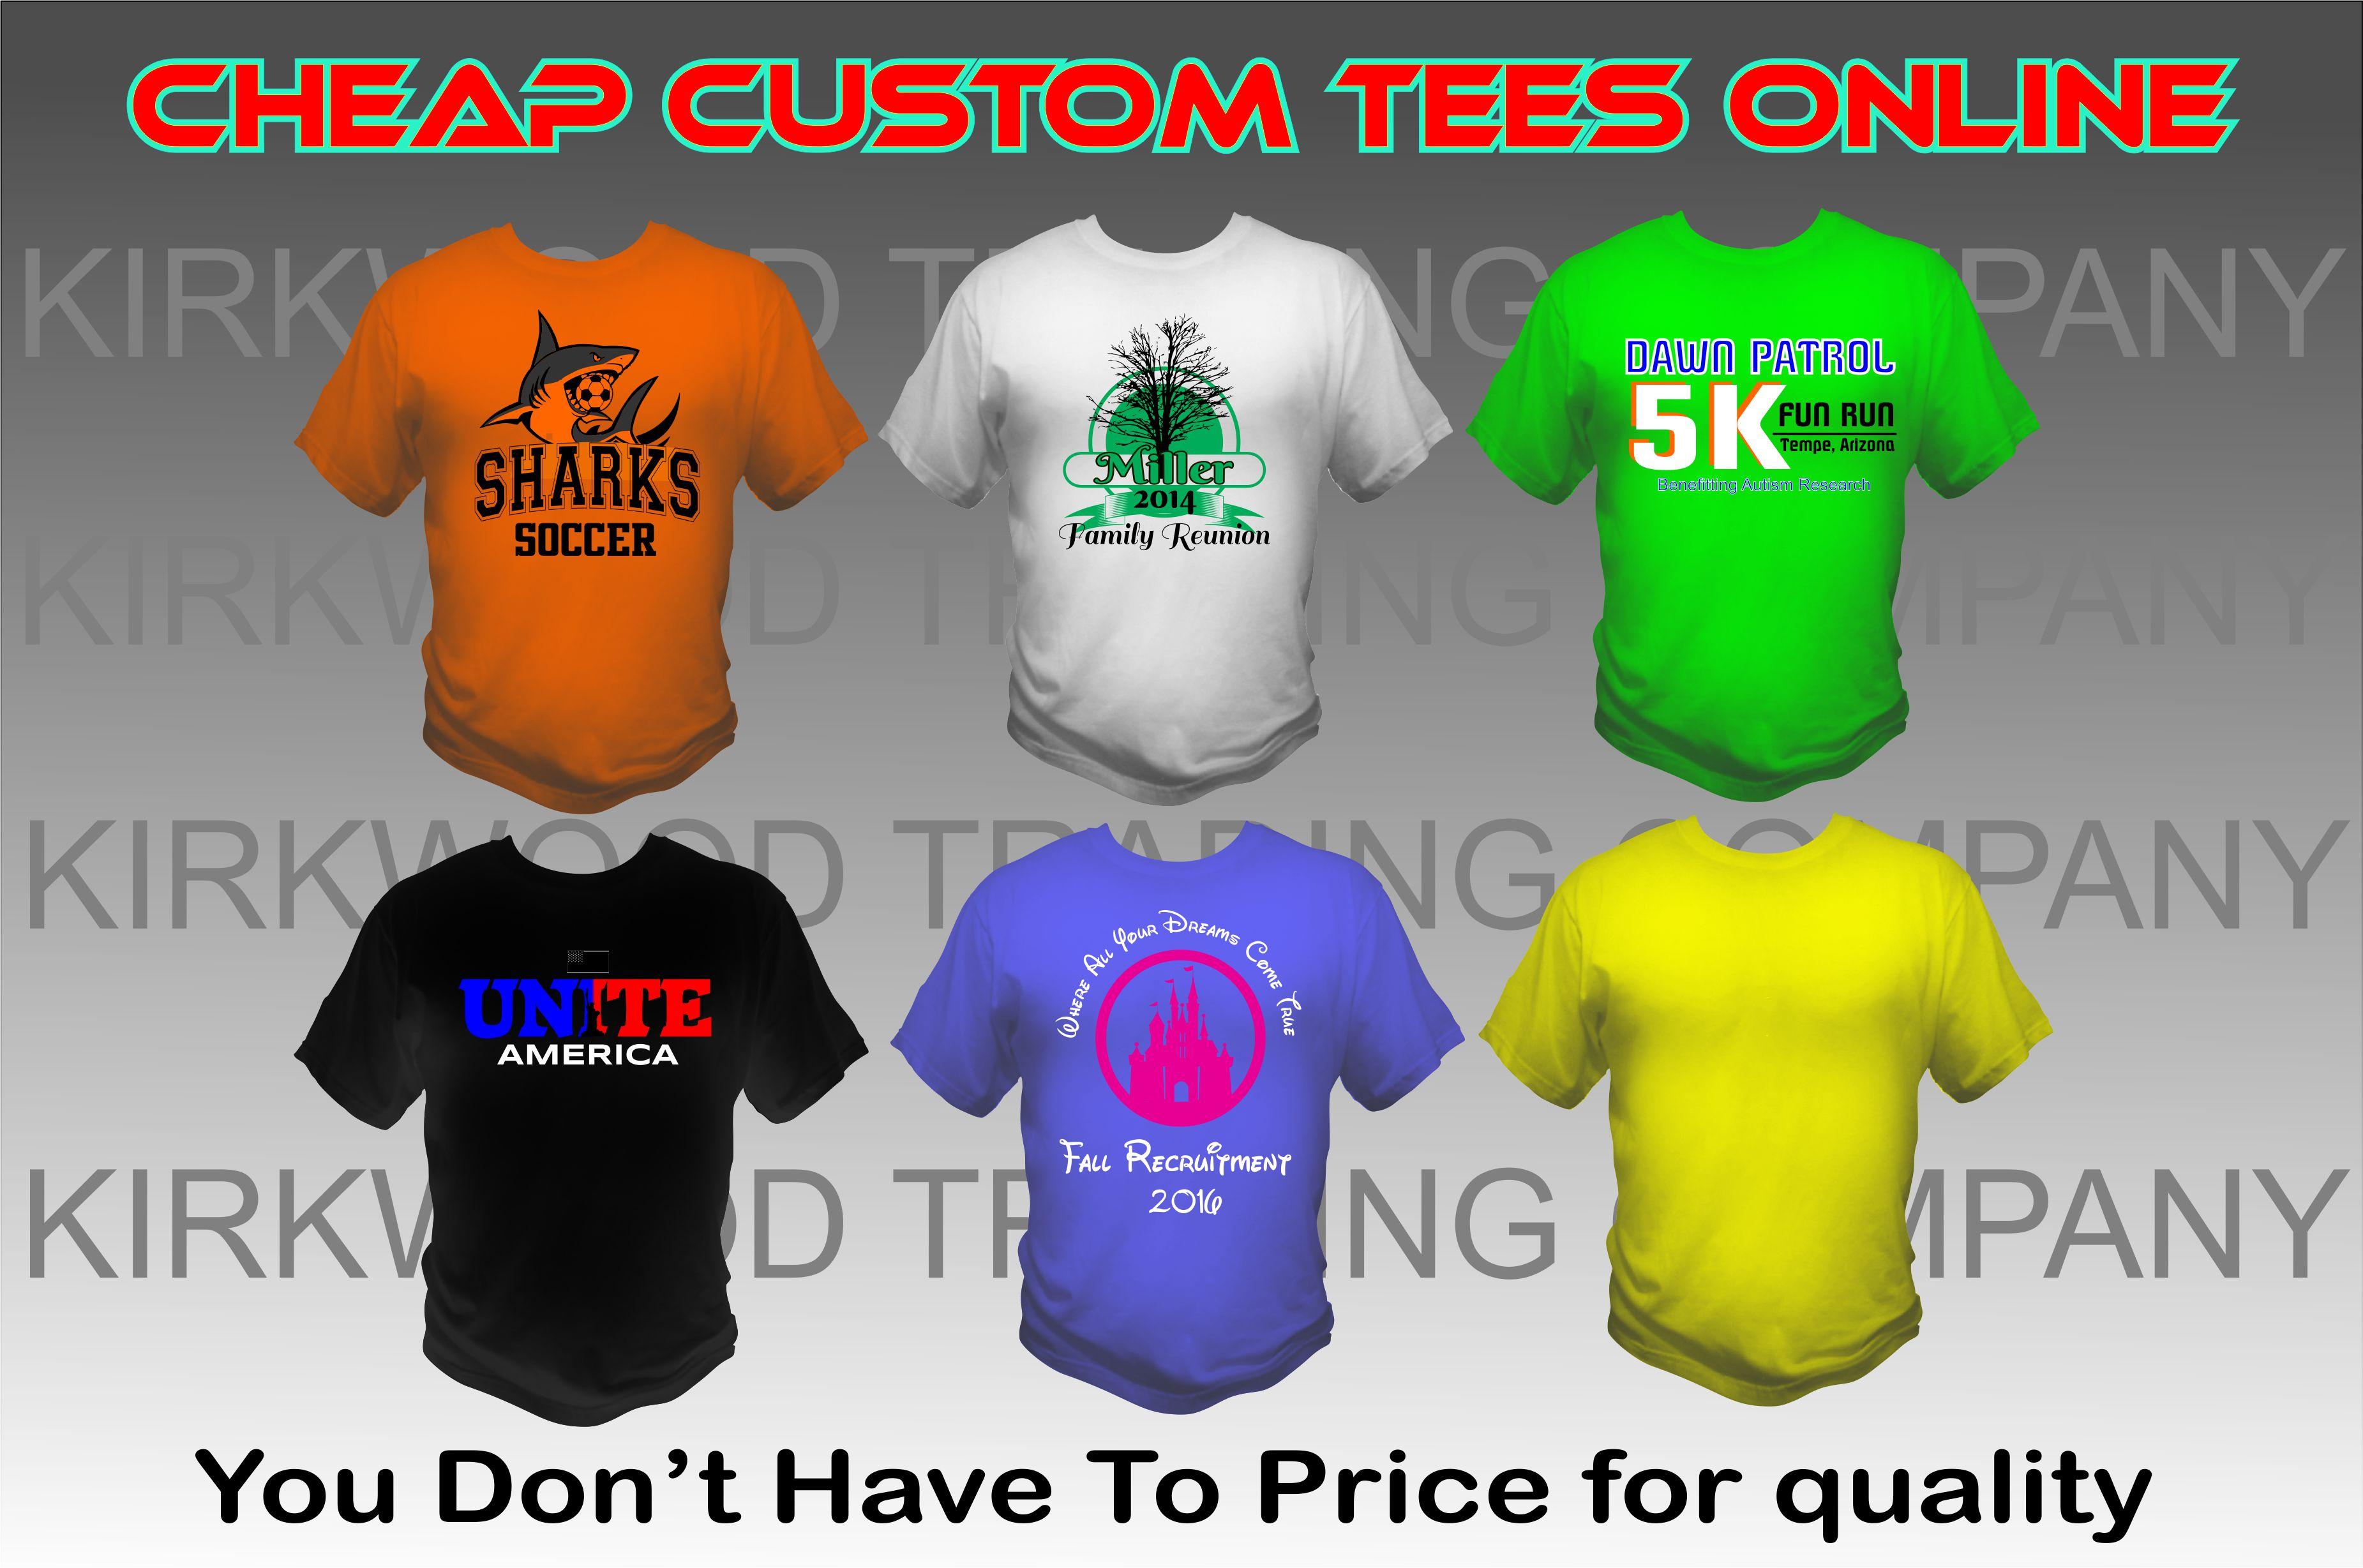 Cheap Custom Tees Online